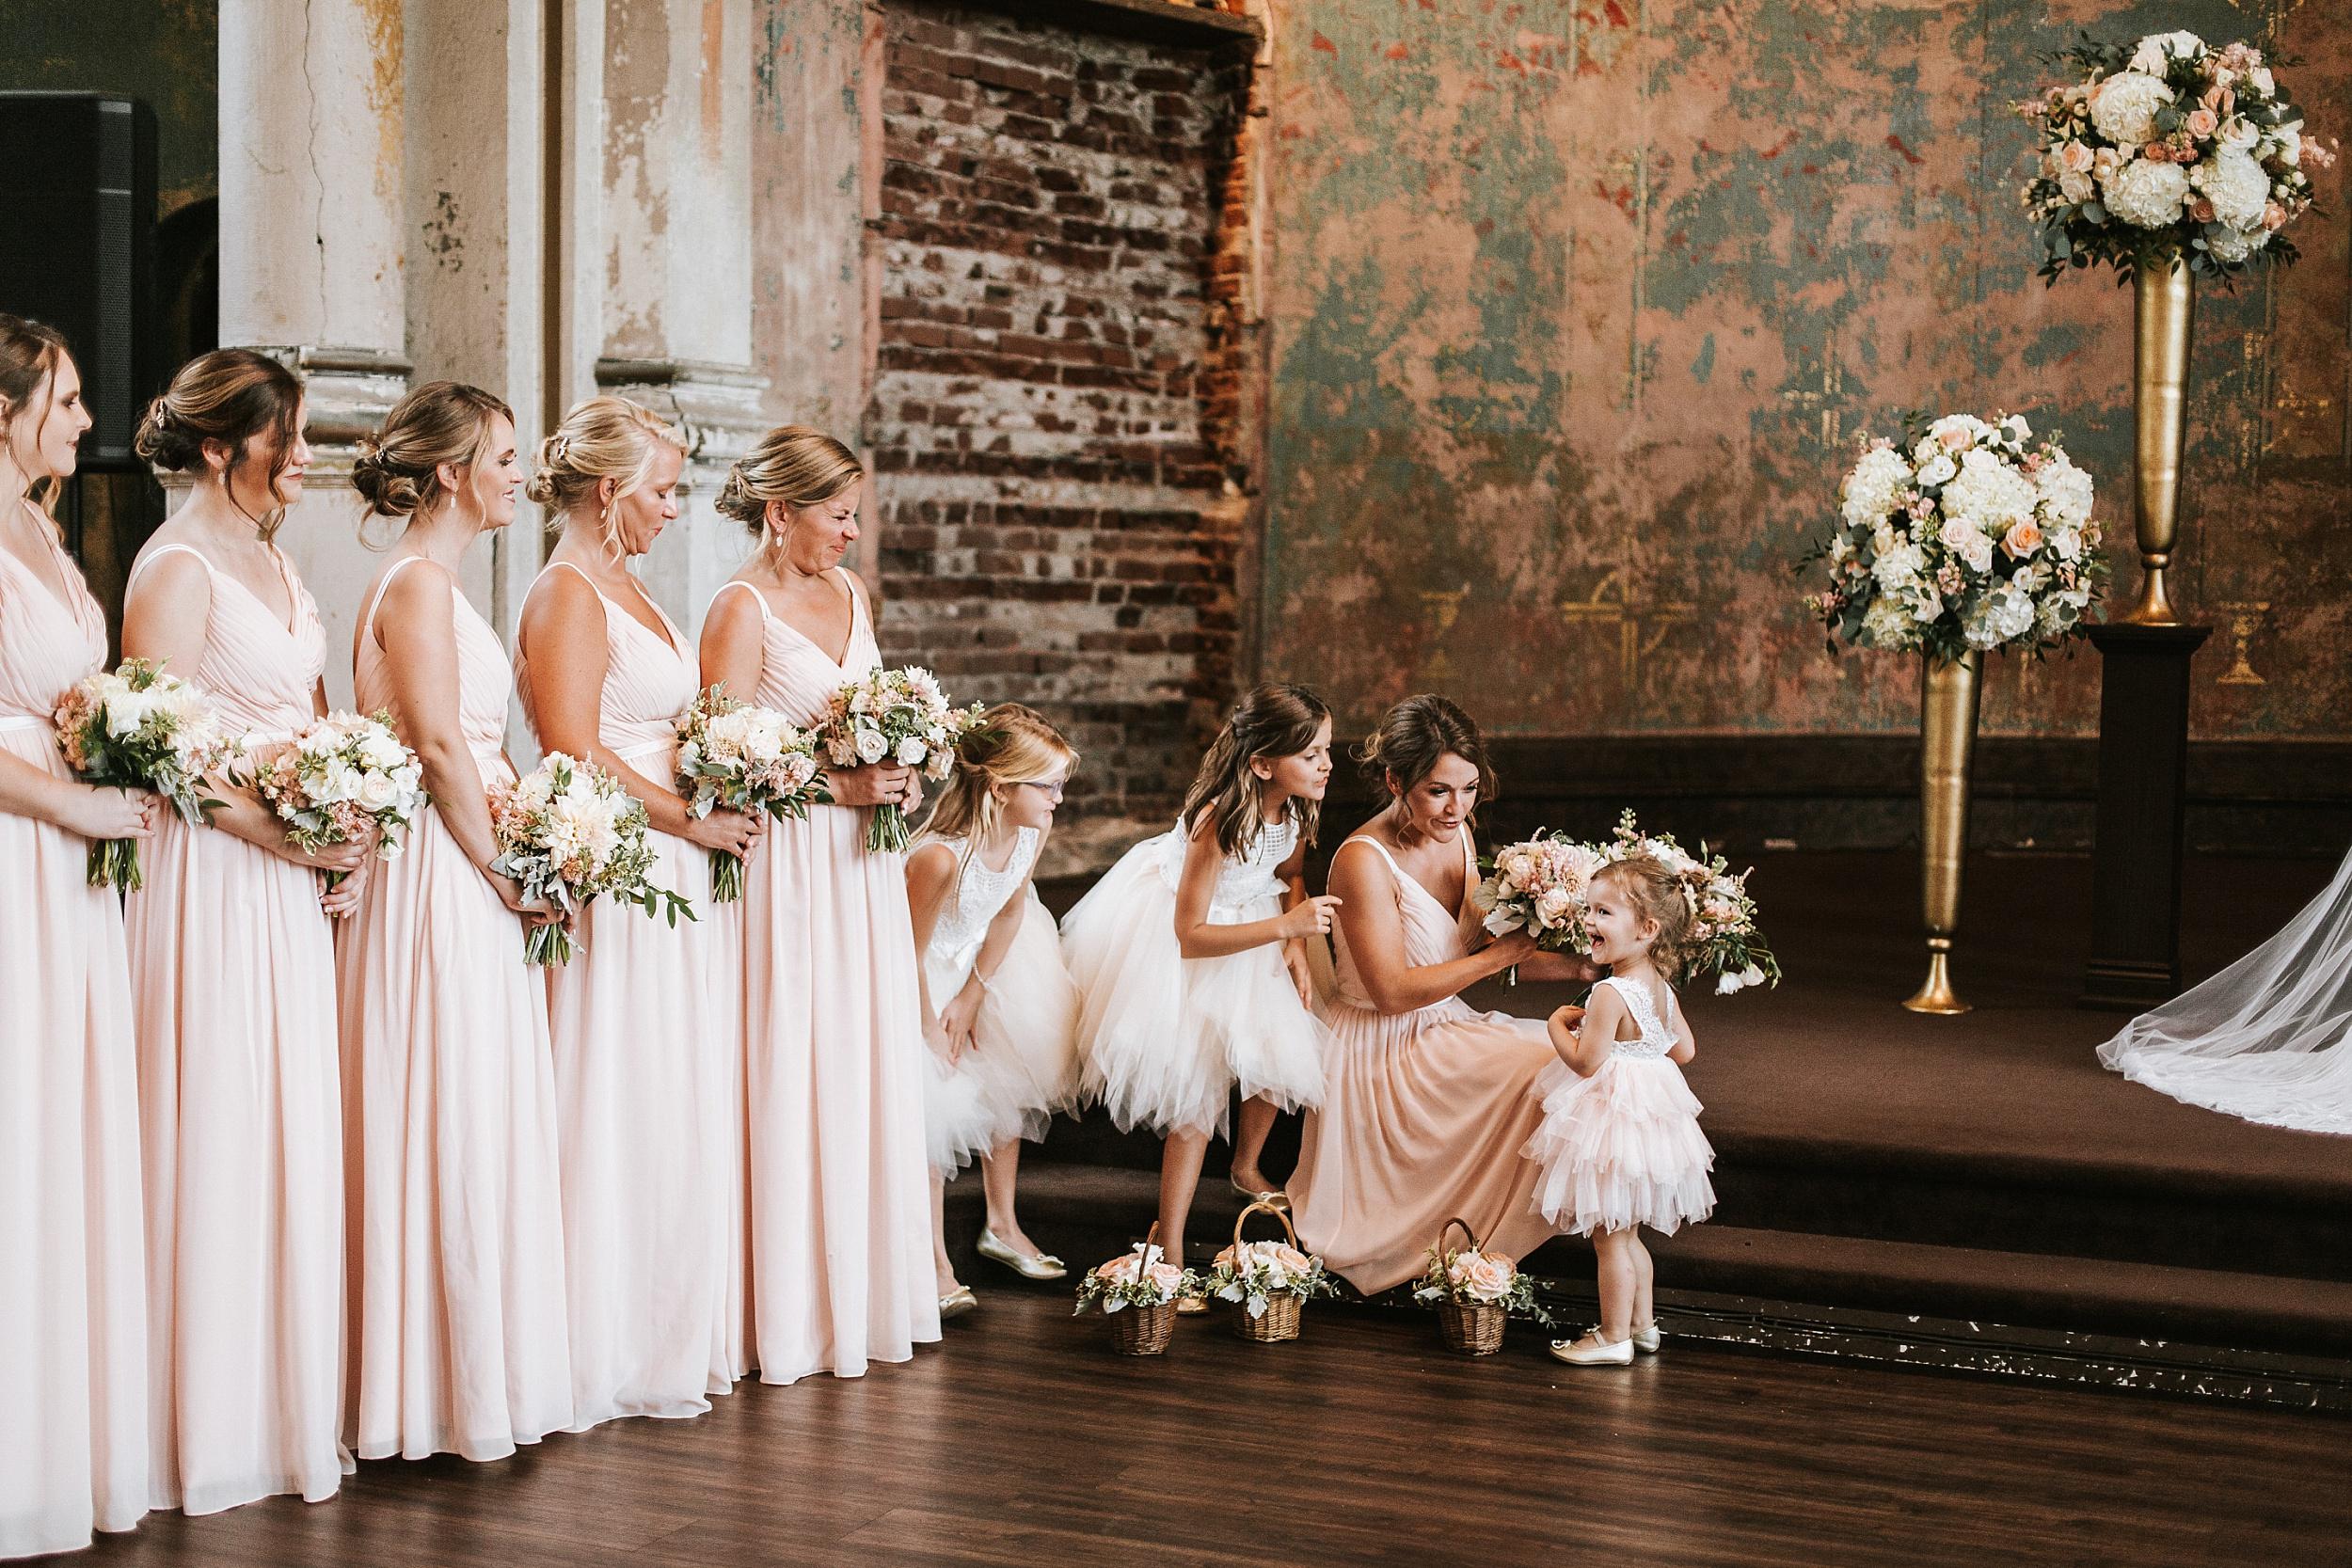 Brooke Townsend Photography - Cincinnati Wedding Photographer (115 of 170).jpg